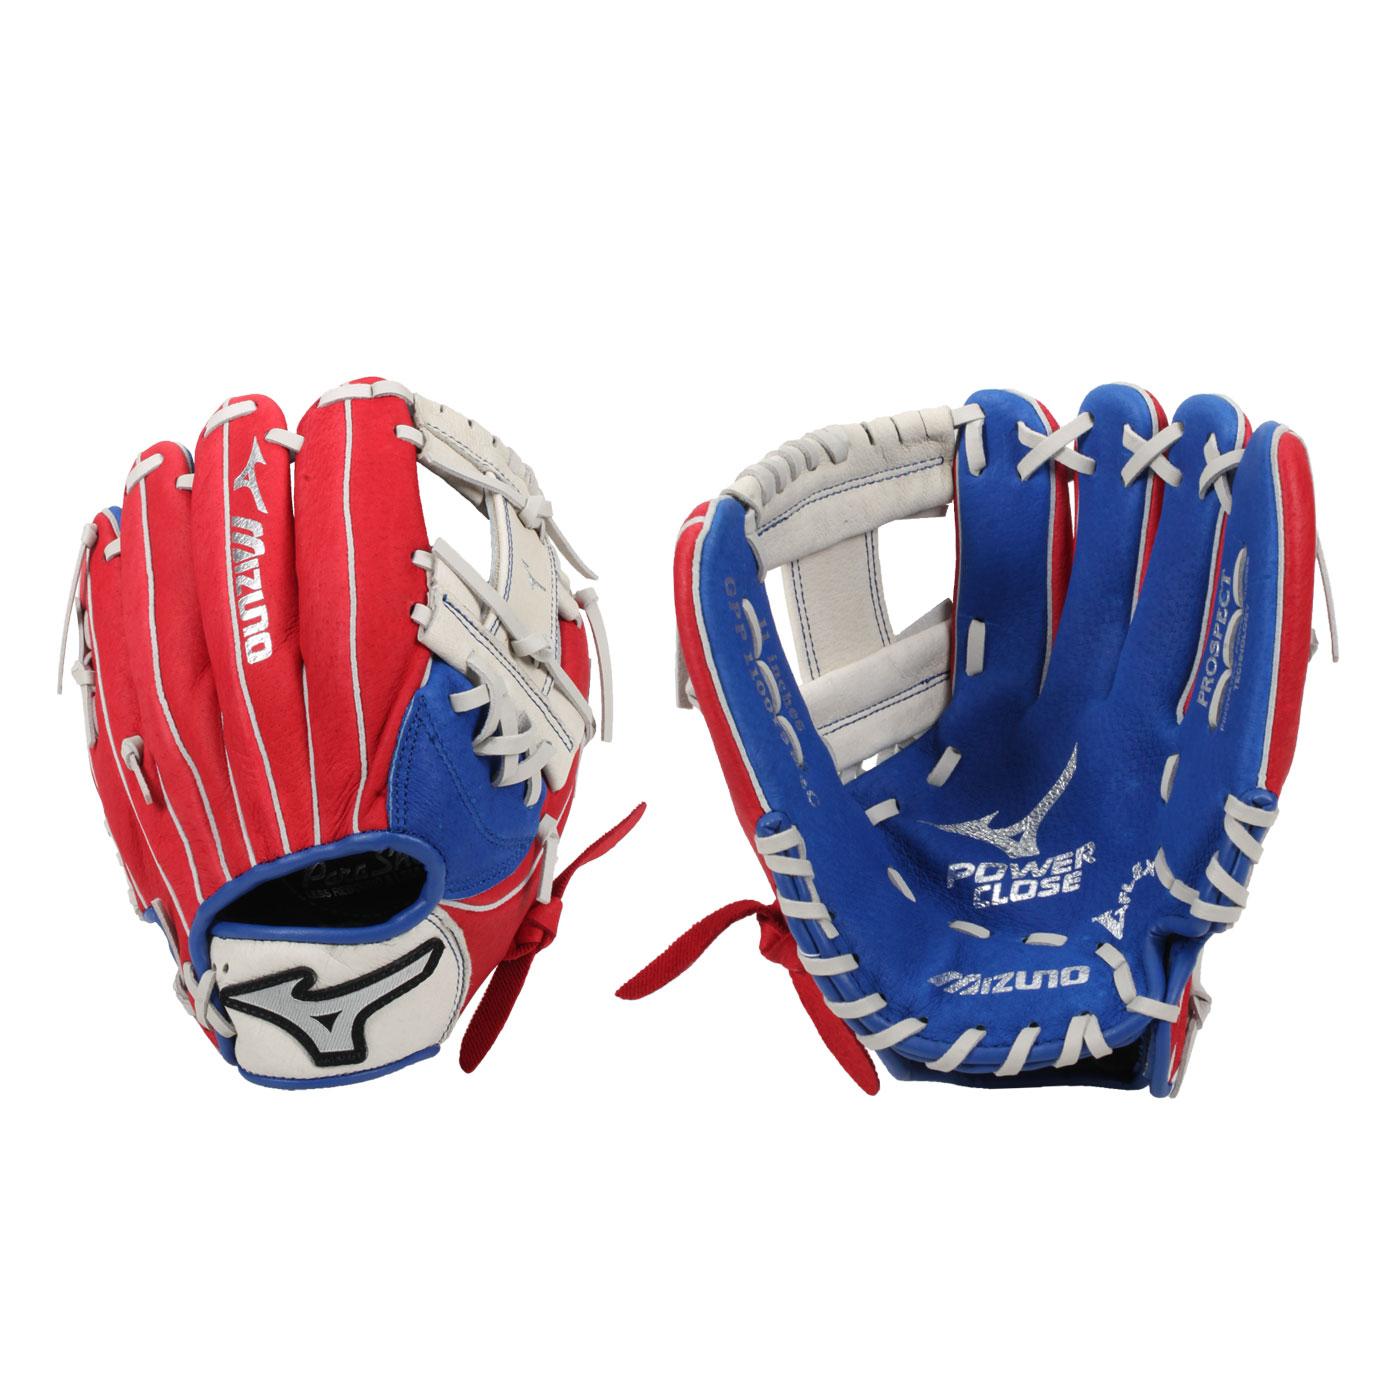 MIZUNO 少年用手套-右投 312777-R - 紅藍銀